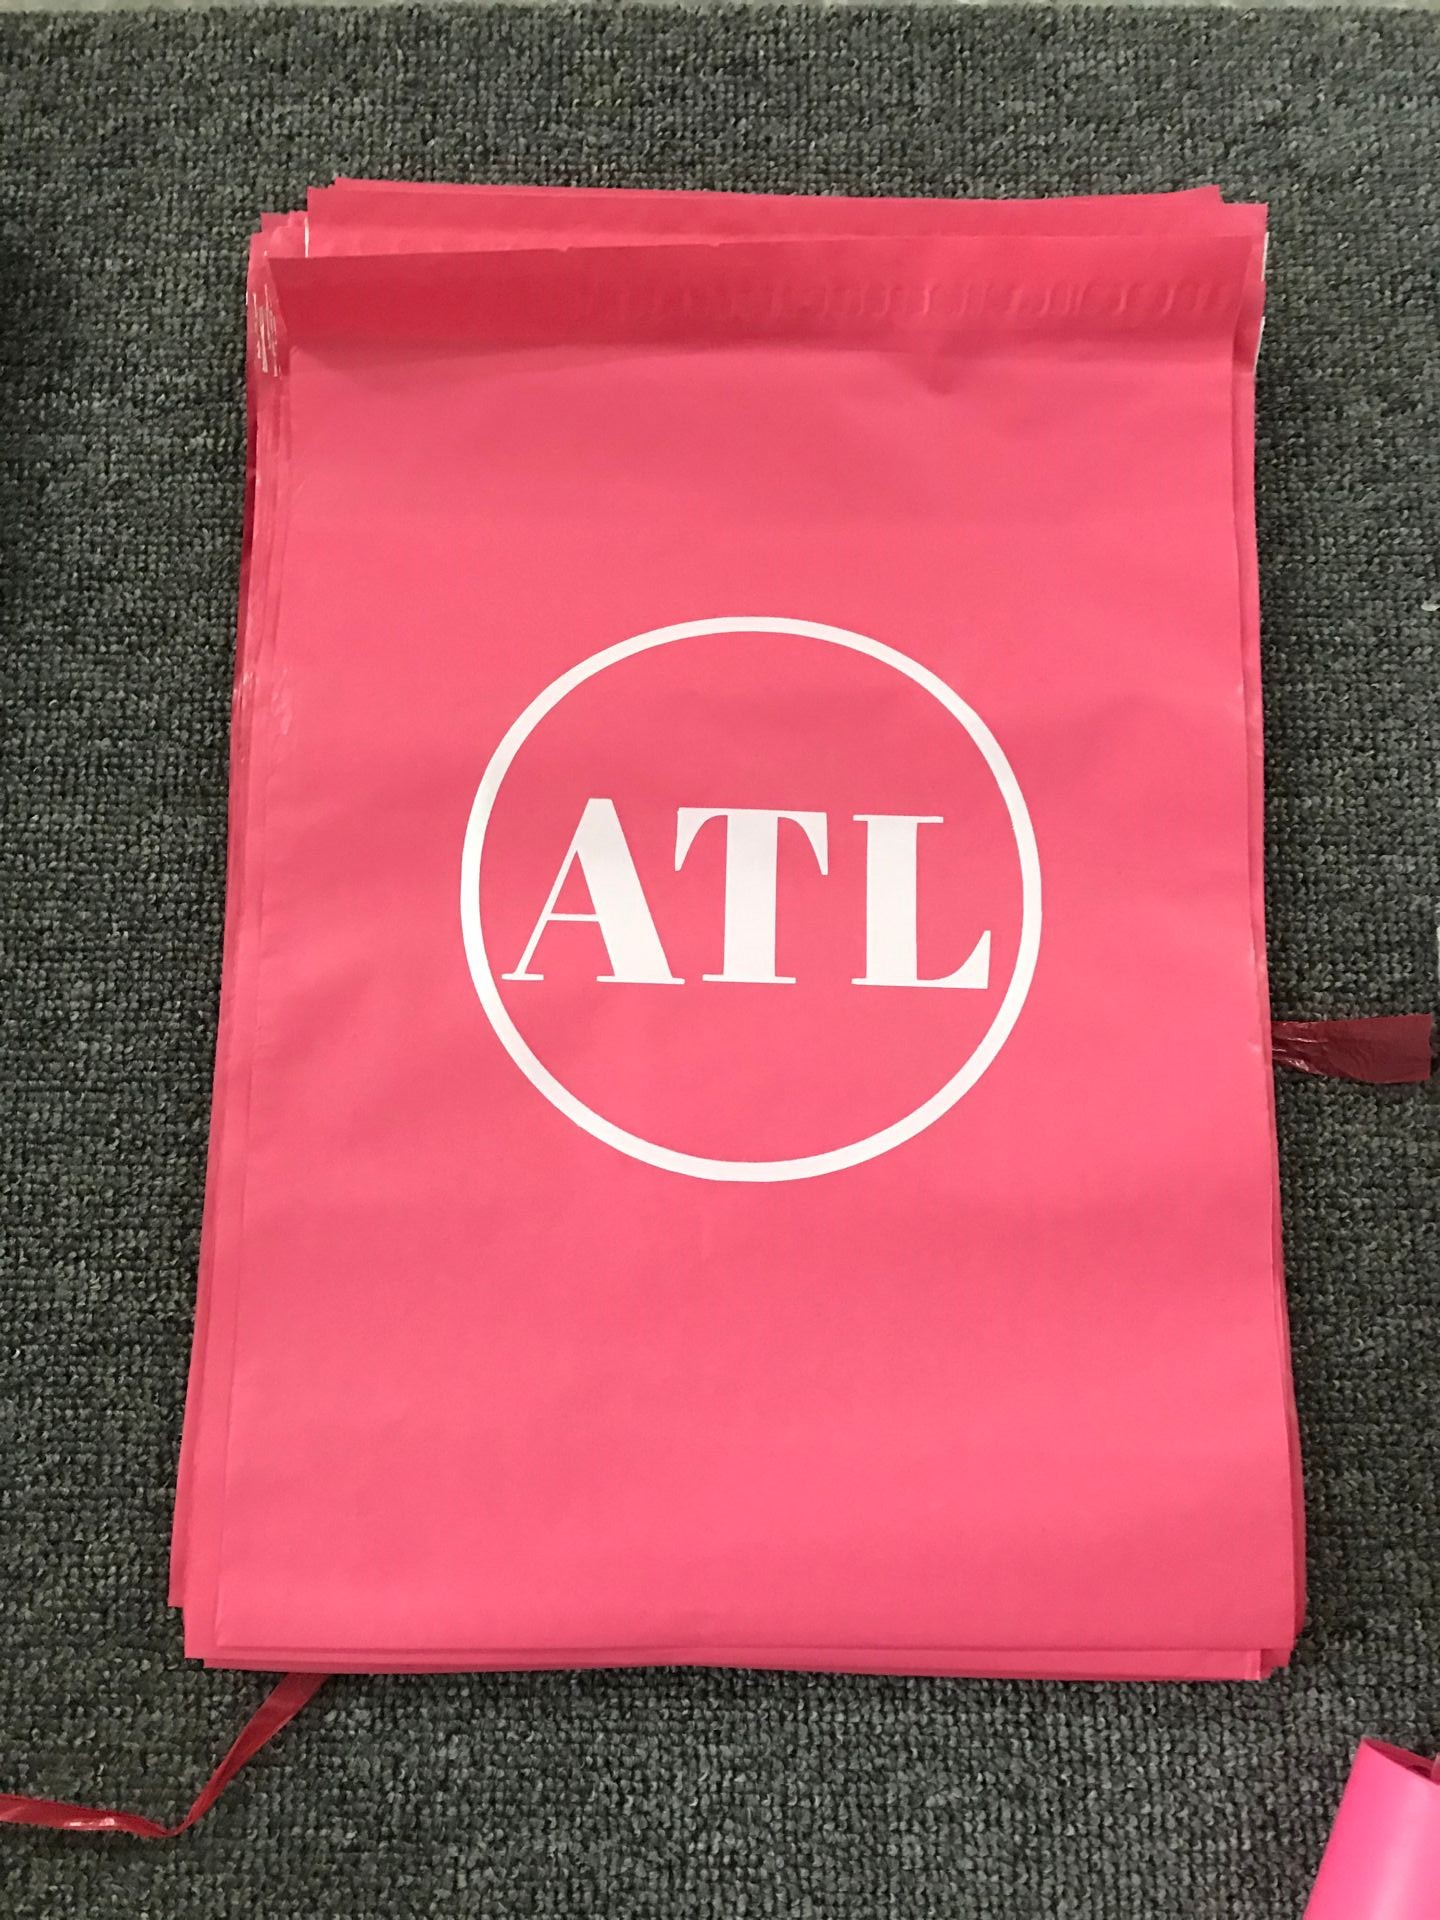 Custom Logo Printed Self Adhesive custom pink poly mailers envelope plastic packaging bags for clothing